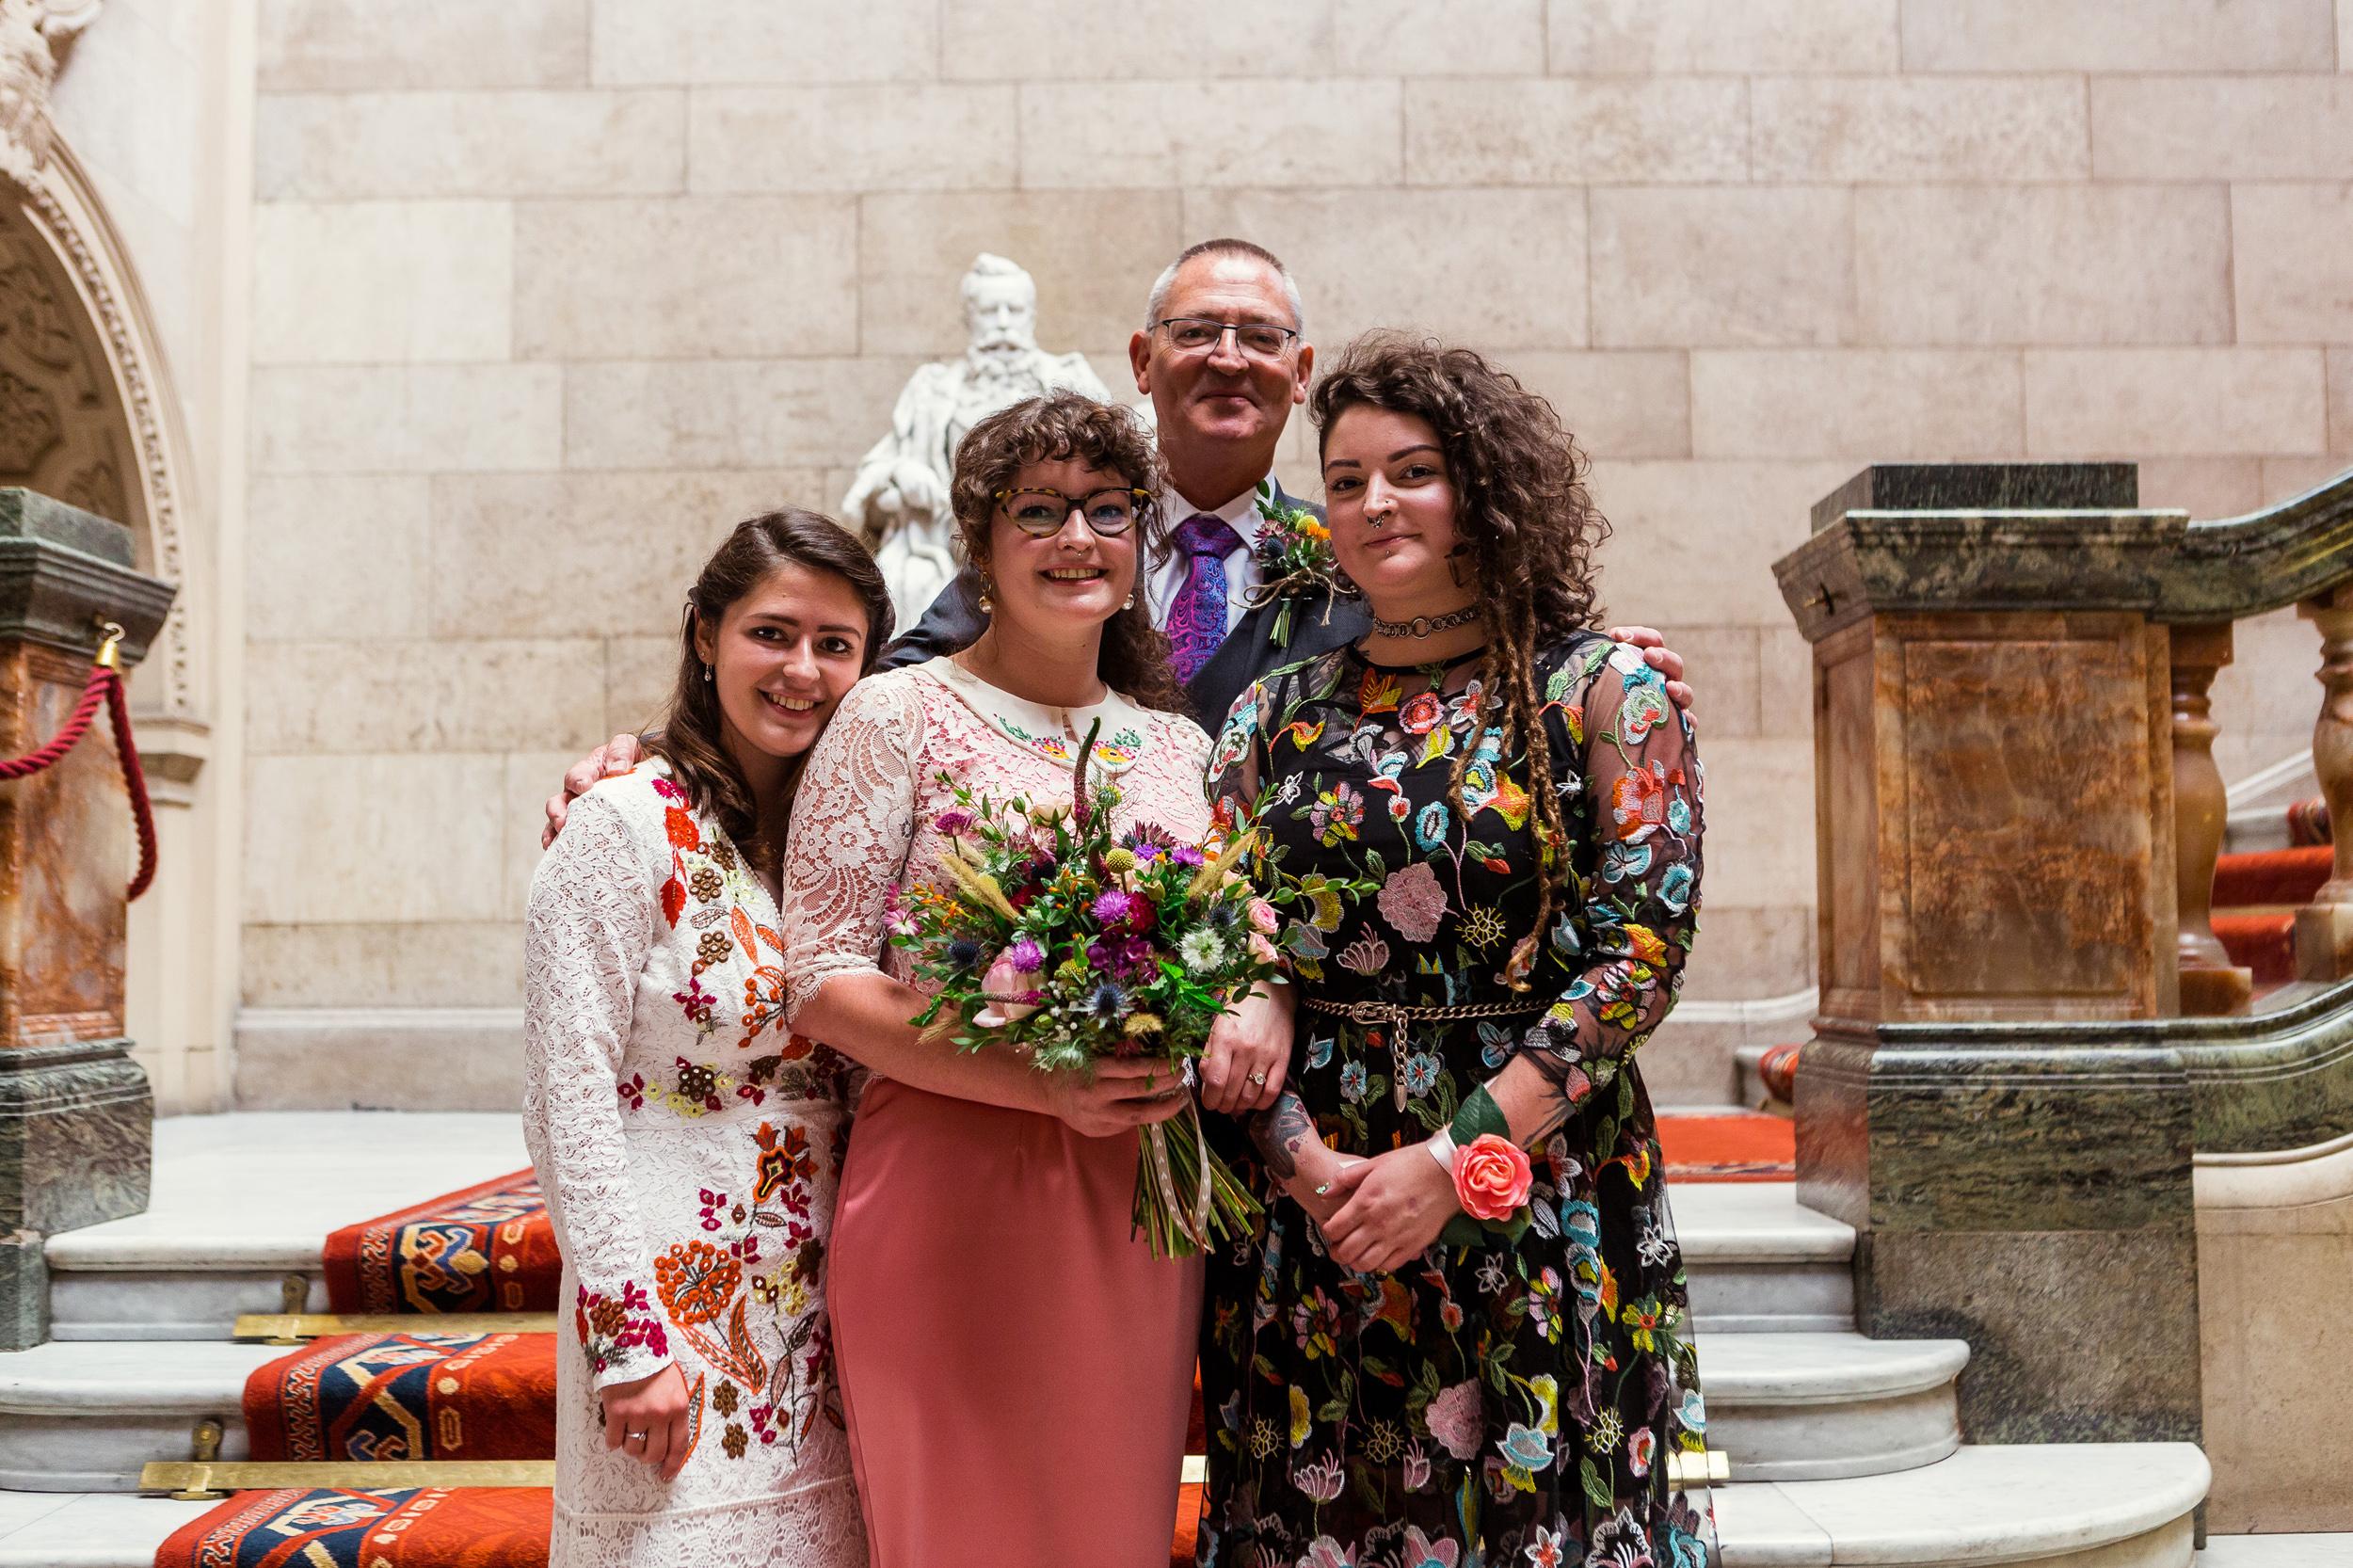 Emma-Coloured-Wedding-Dress-Sheffield-Kate-Beaumont-3.jpg